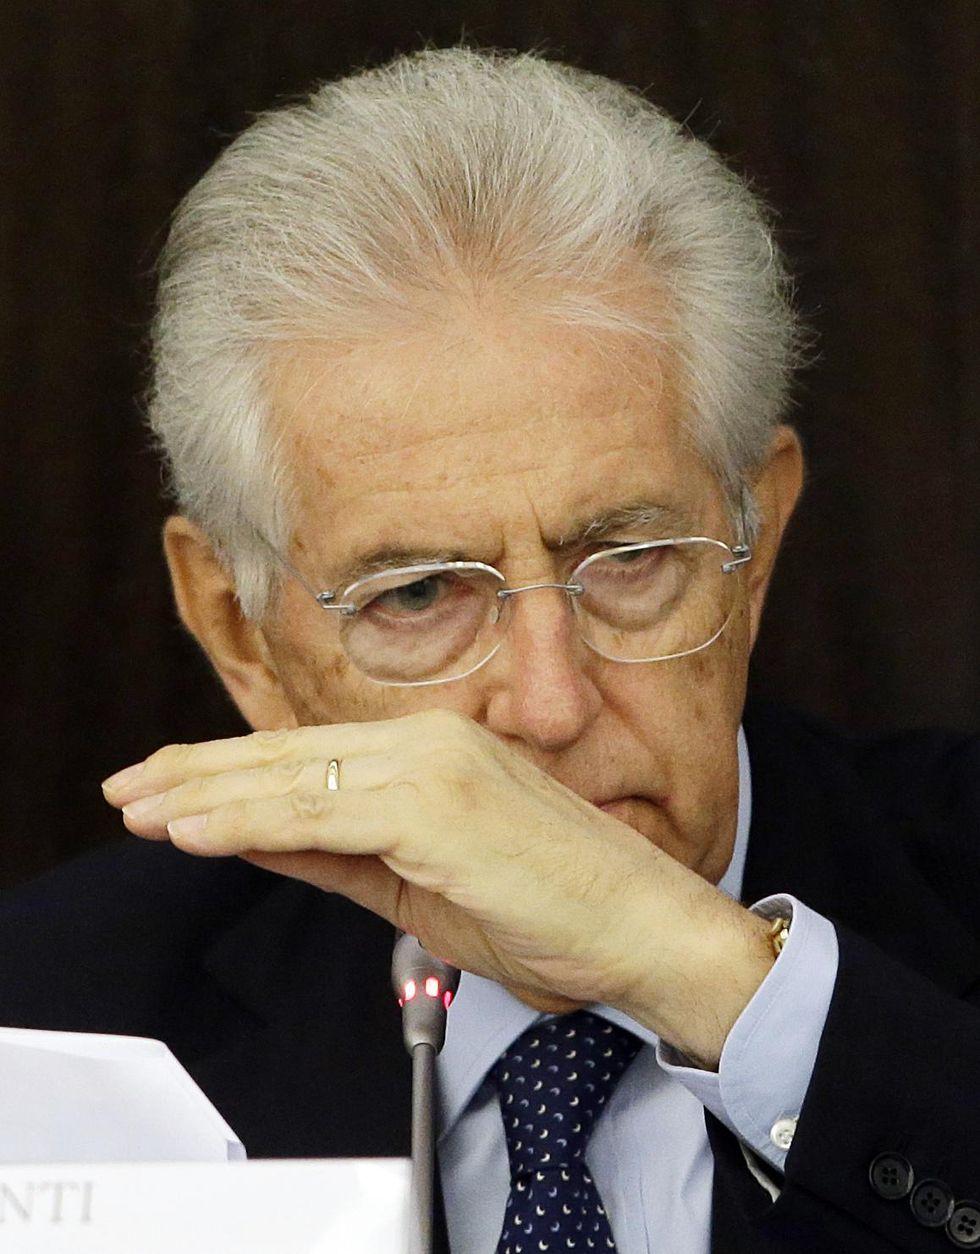 The future of Italian politics after Monti questioned by Professor Alberto Saravalle on WSJ